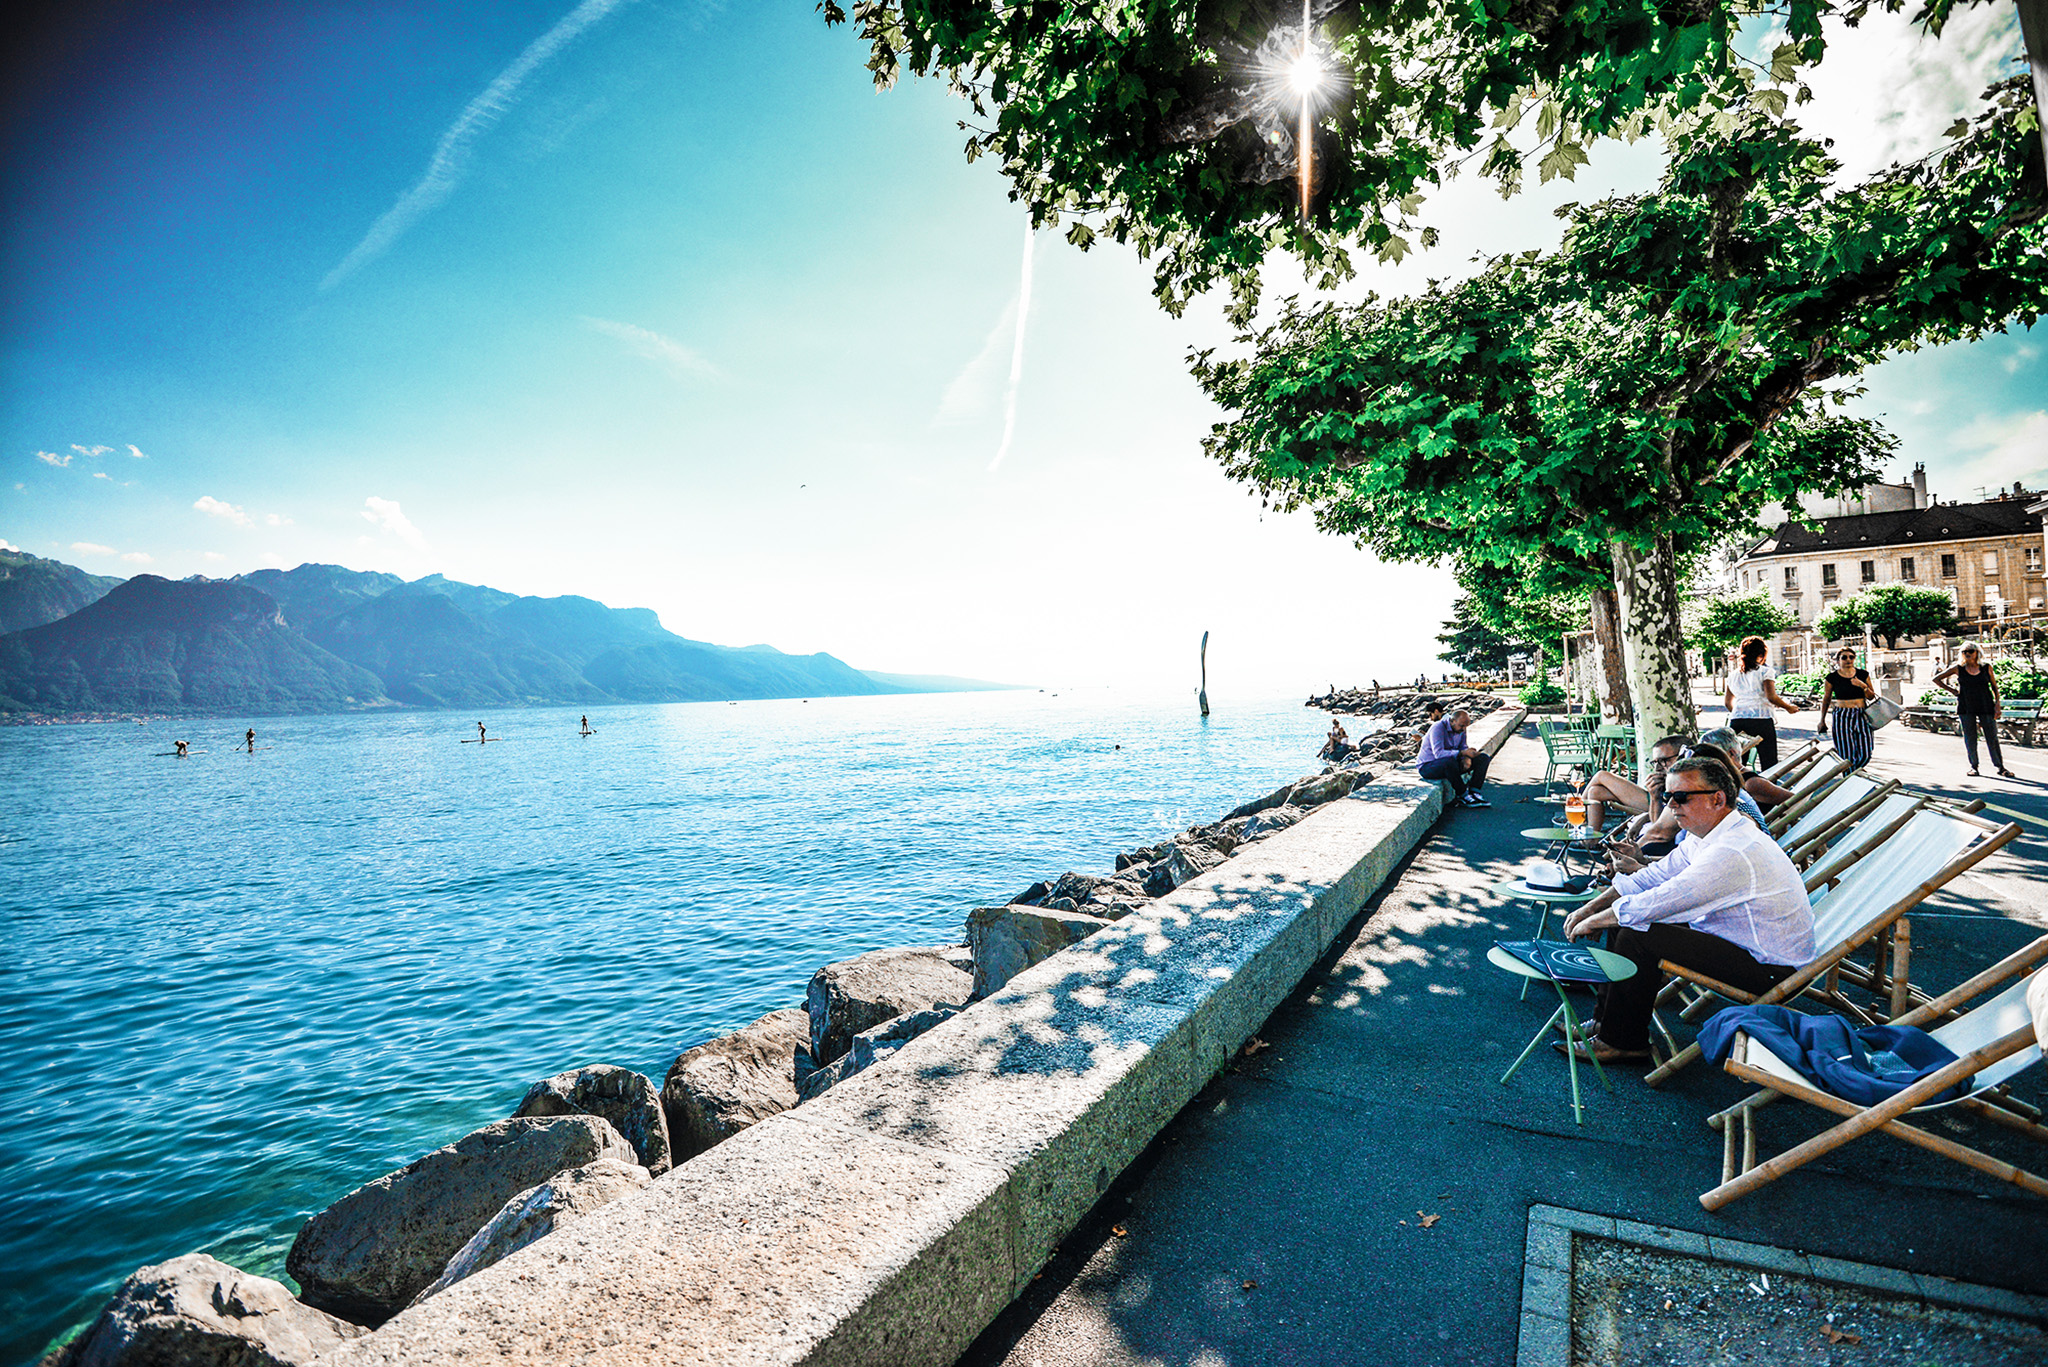 kt_2020_300_Keytours_excursions_Swisstours_vevey-city2_2048_10